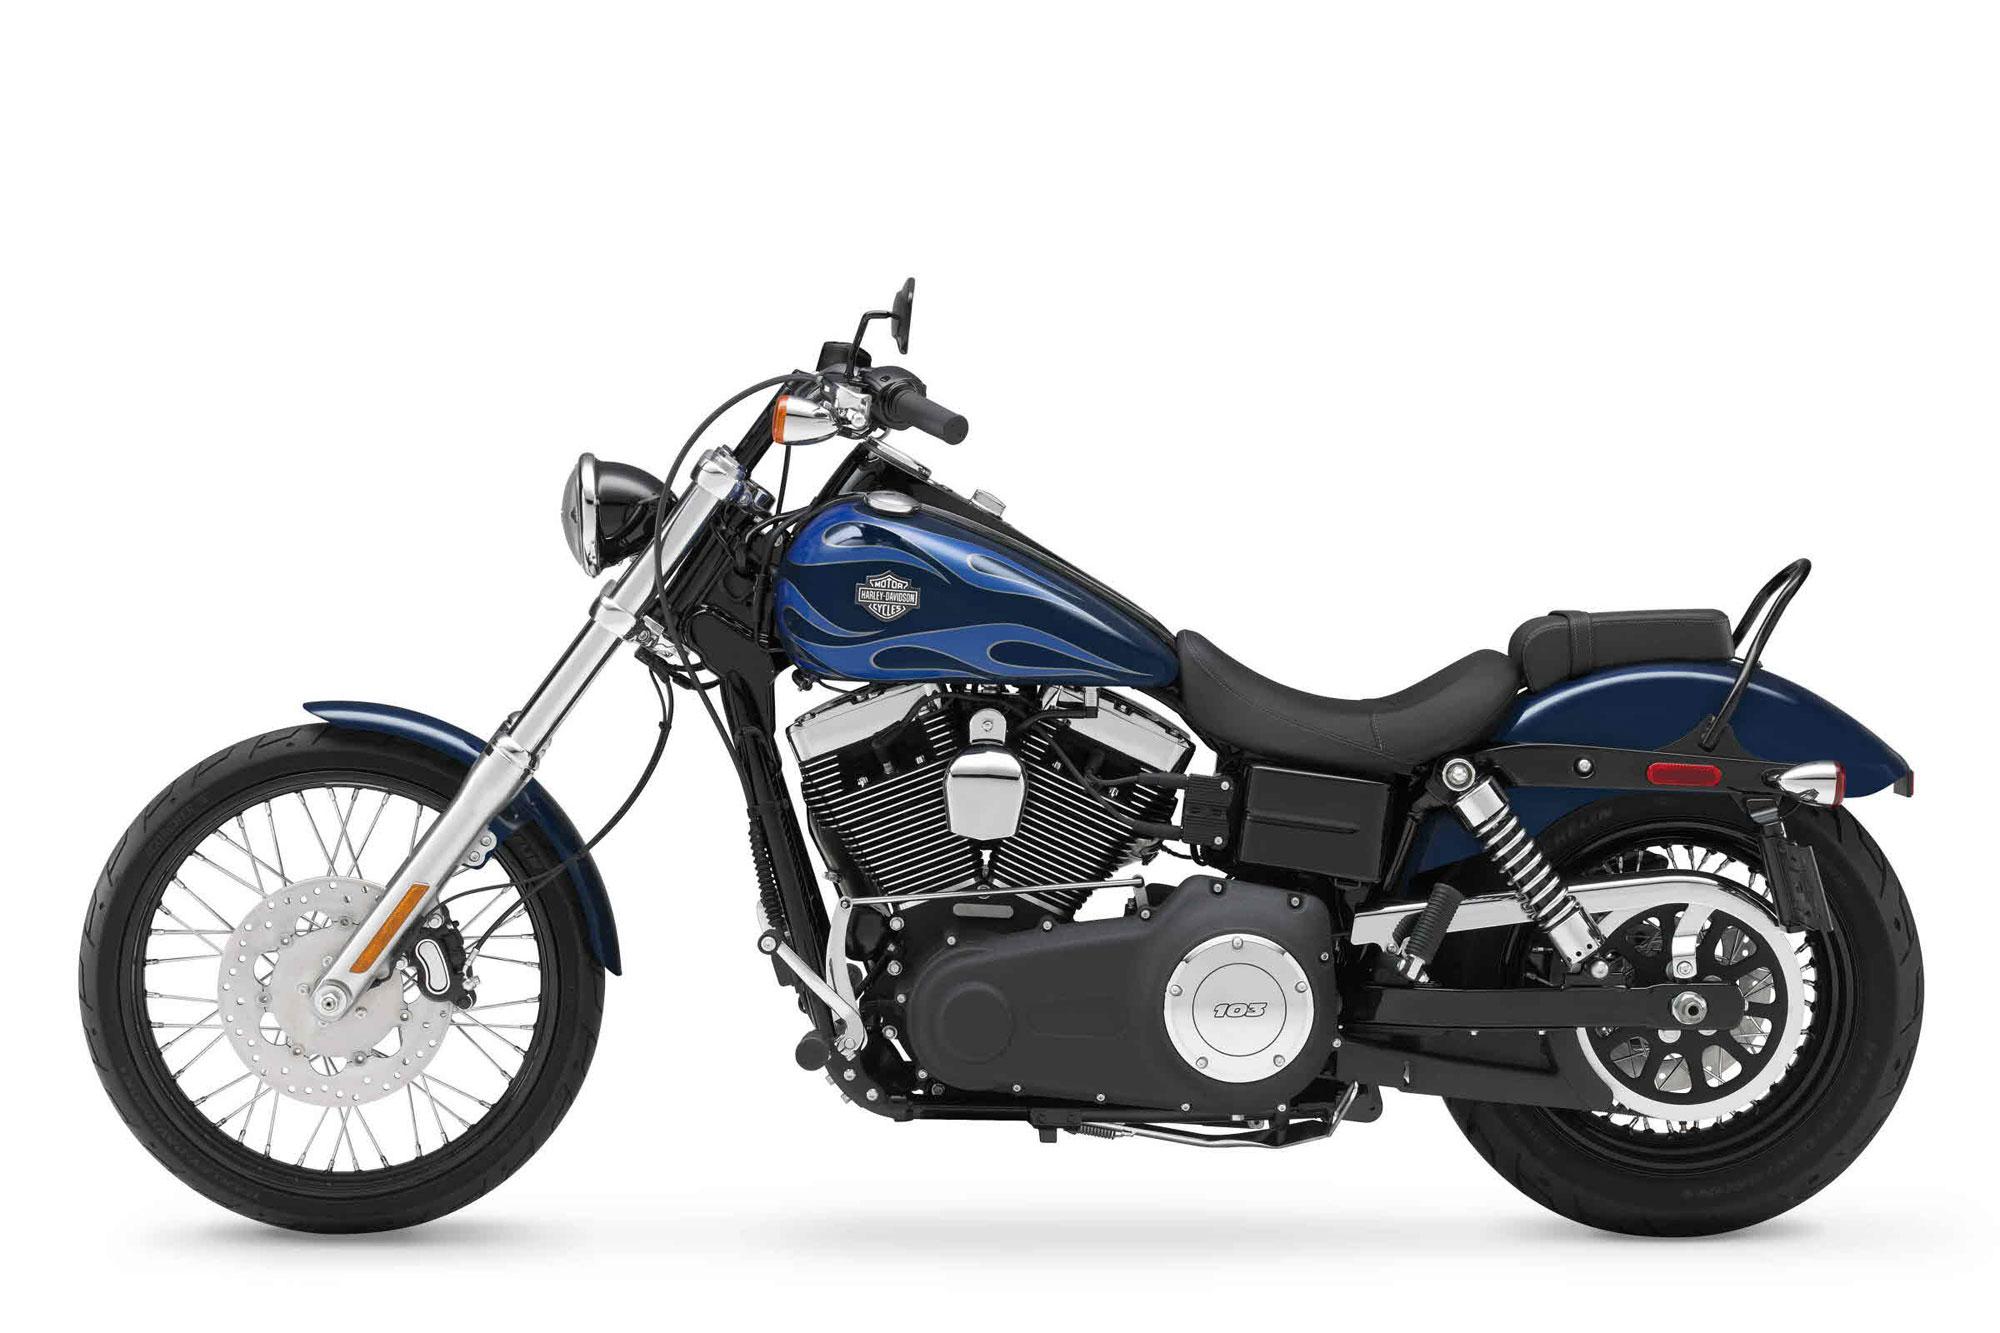 LZ_5716] Harley Davidson Dyna Super Glide Wiring Diagram Free DiagramShopa Bupi Phot Ndine Aryon Hapolo Mohammedshrine Librar Wiring 101